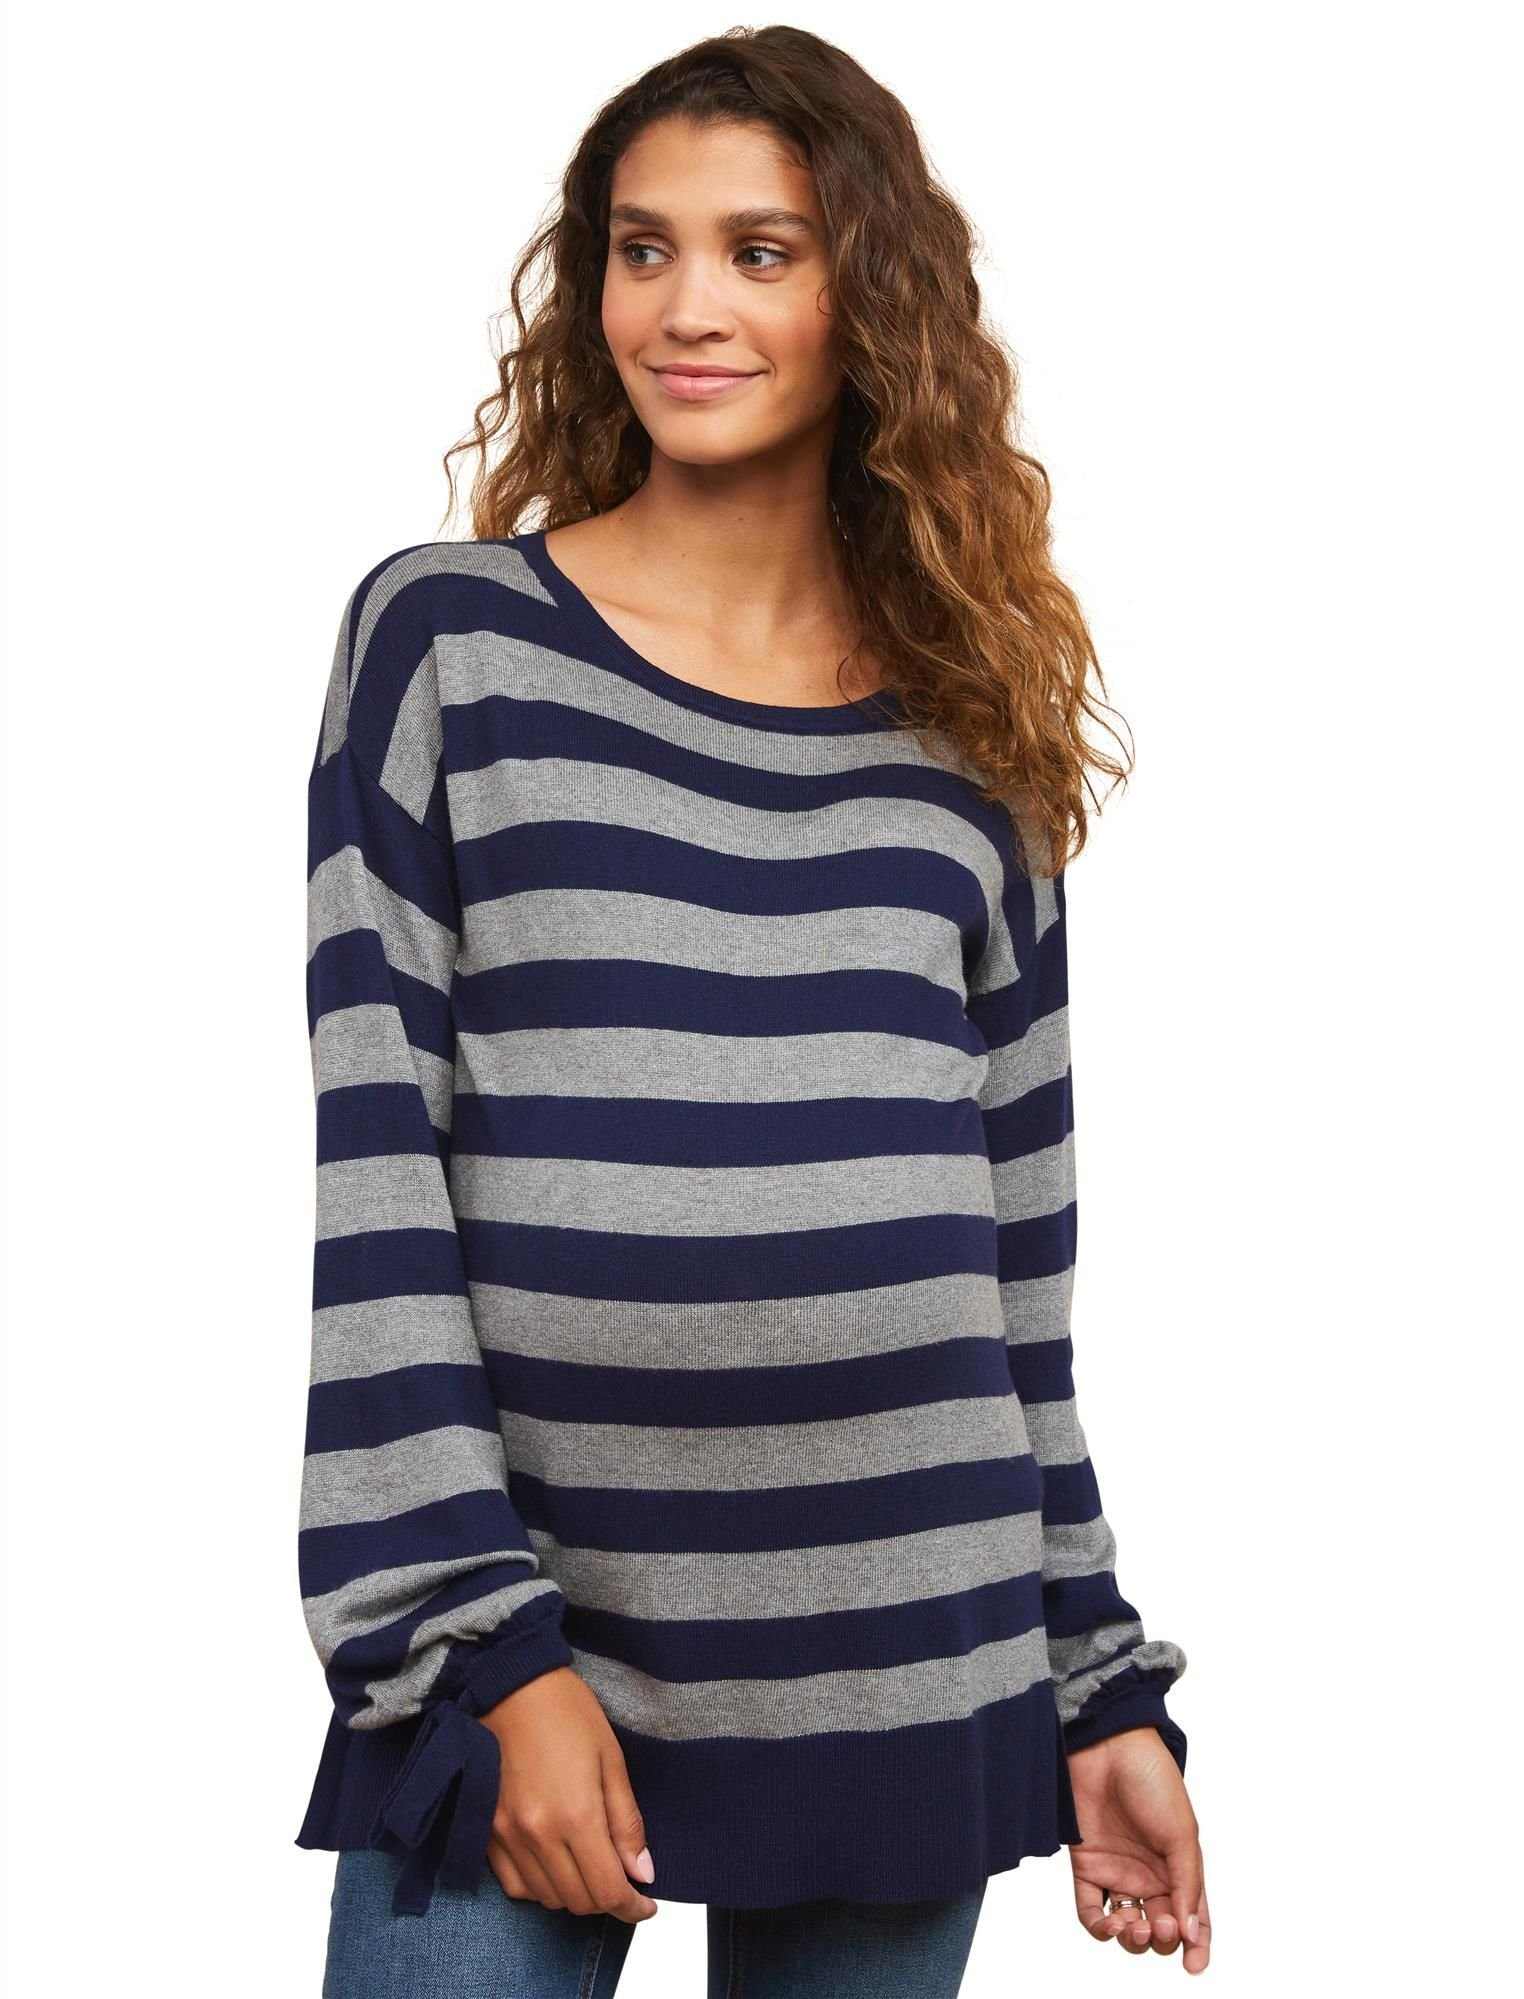 Motherhood Maternity Women's Maternity Balloon Long Sleeve Boxy Pullover Sweater, Navy and Grey Stripe, Medium